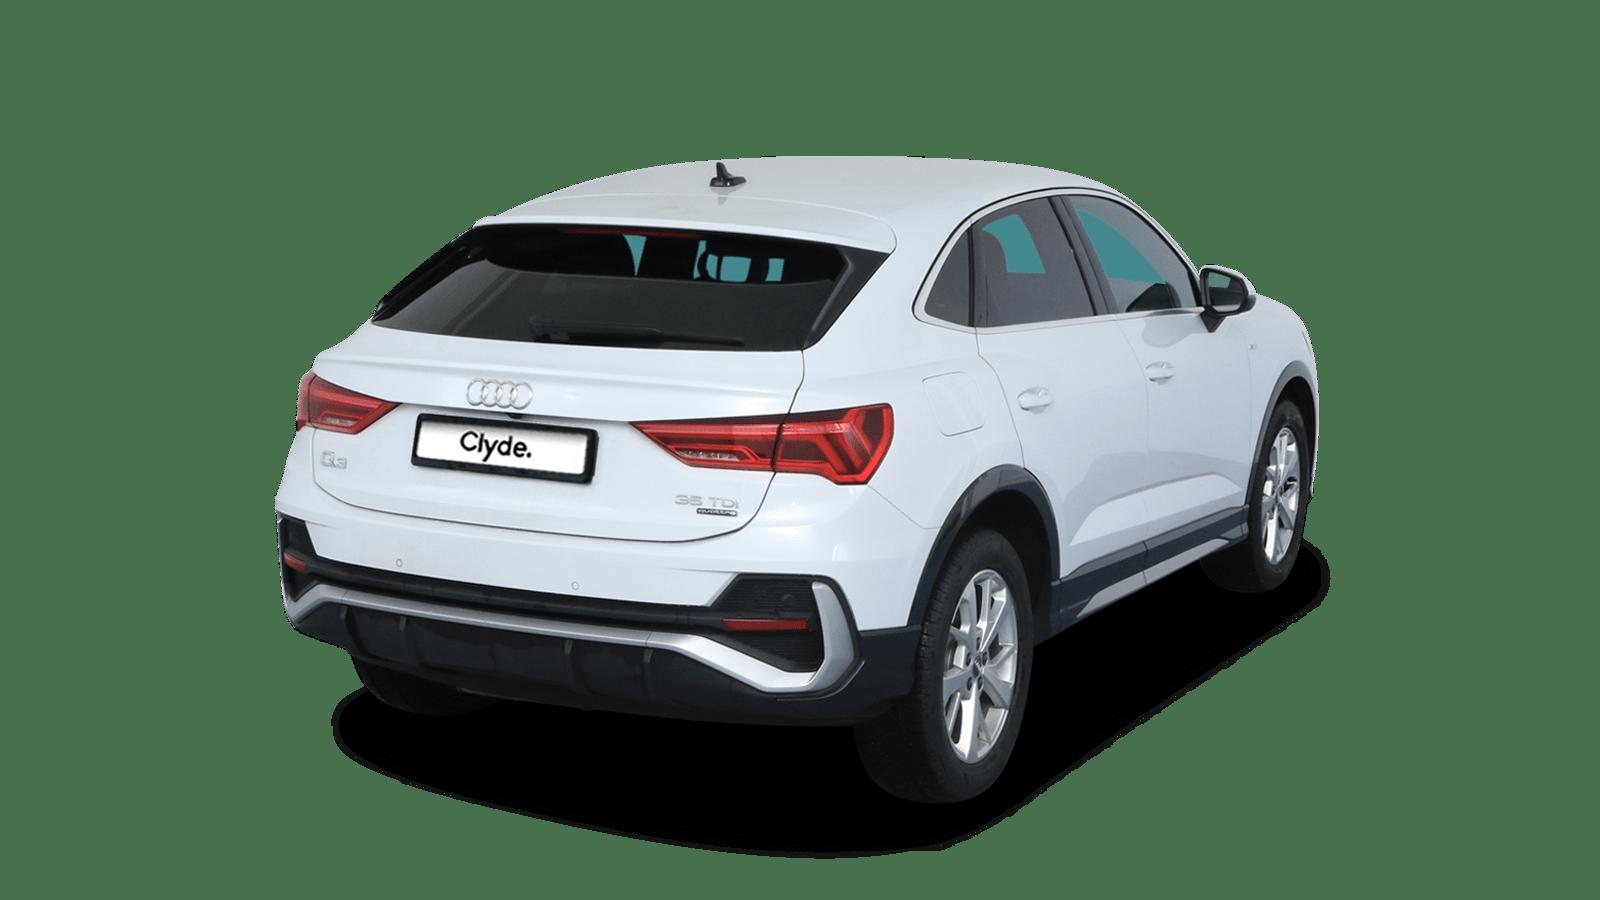 Audi Q3 Sportback White front - Clyde car subscription